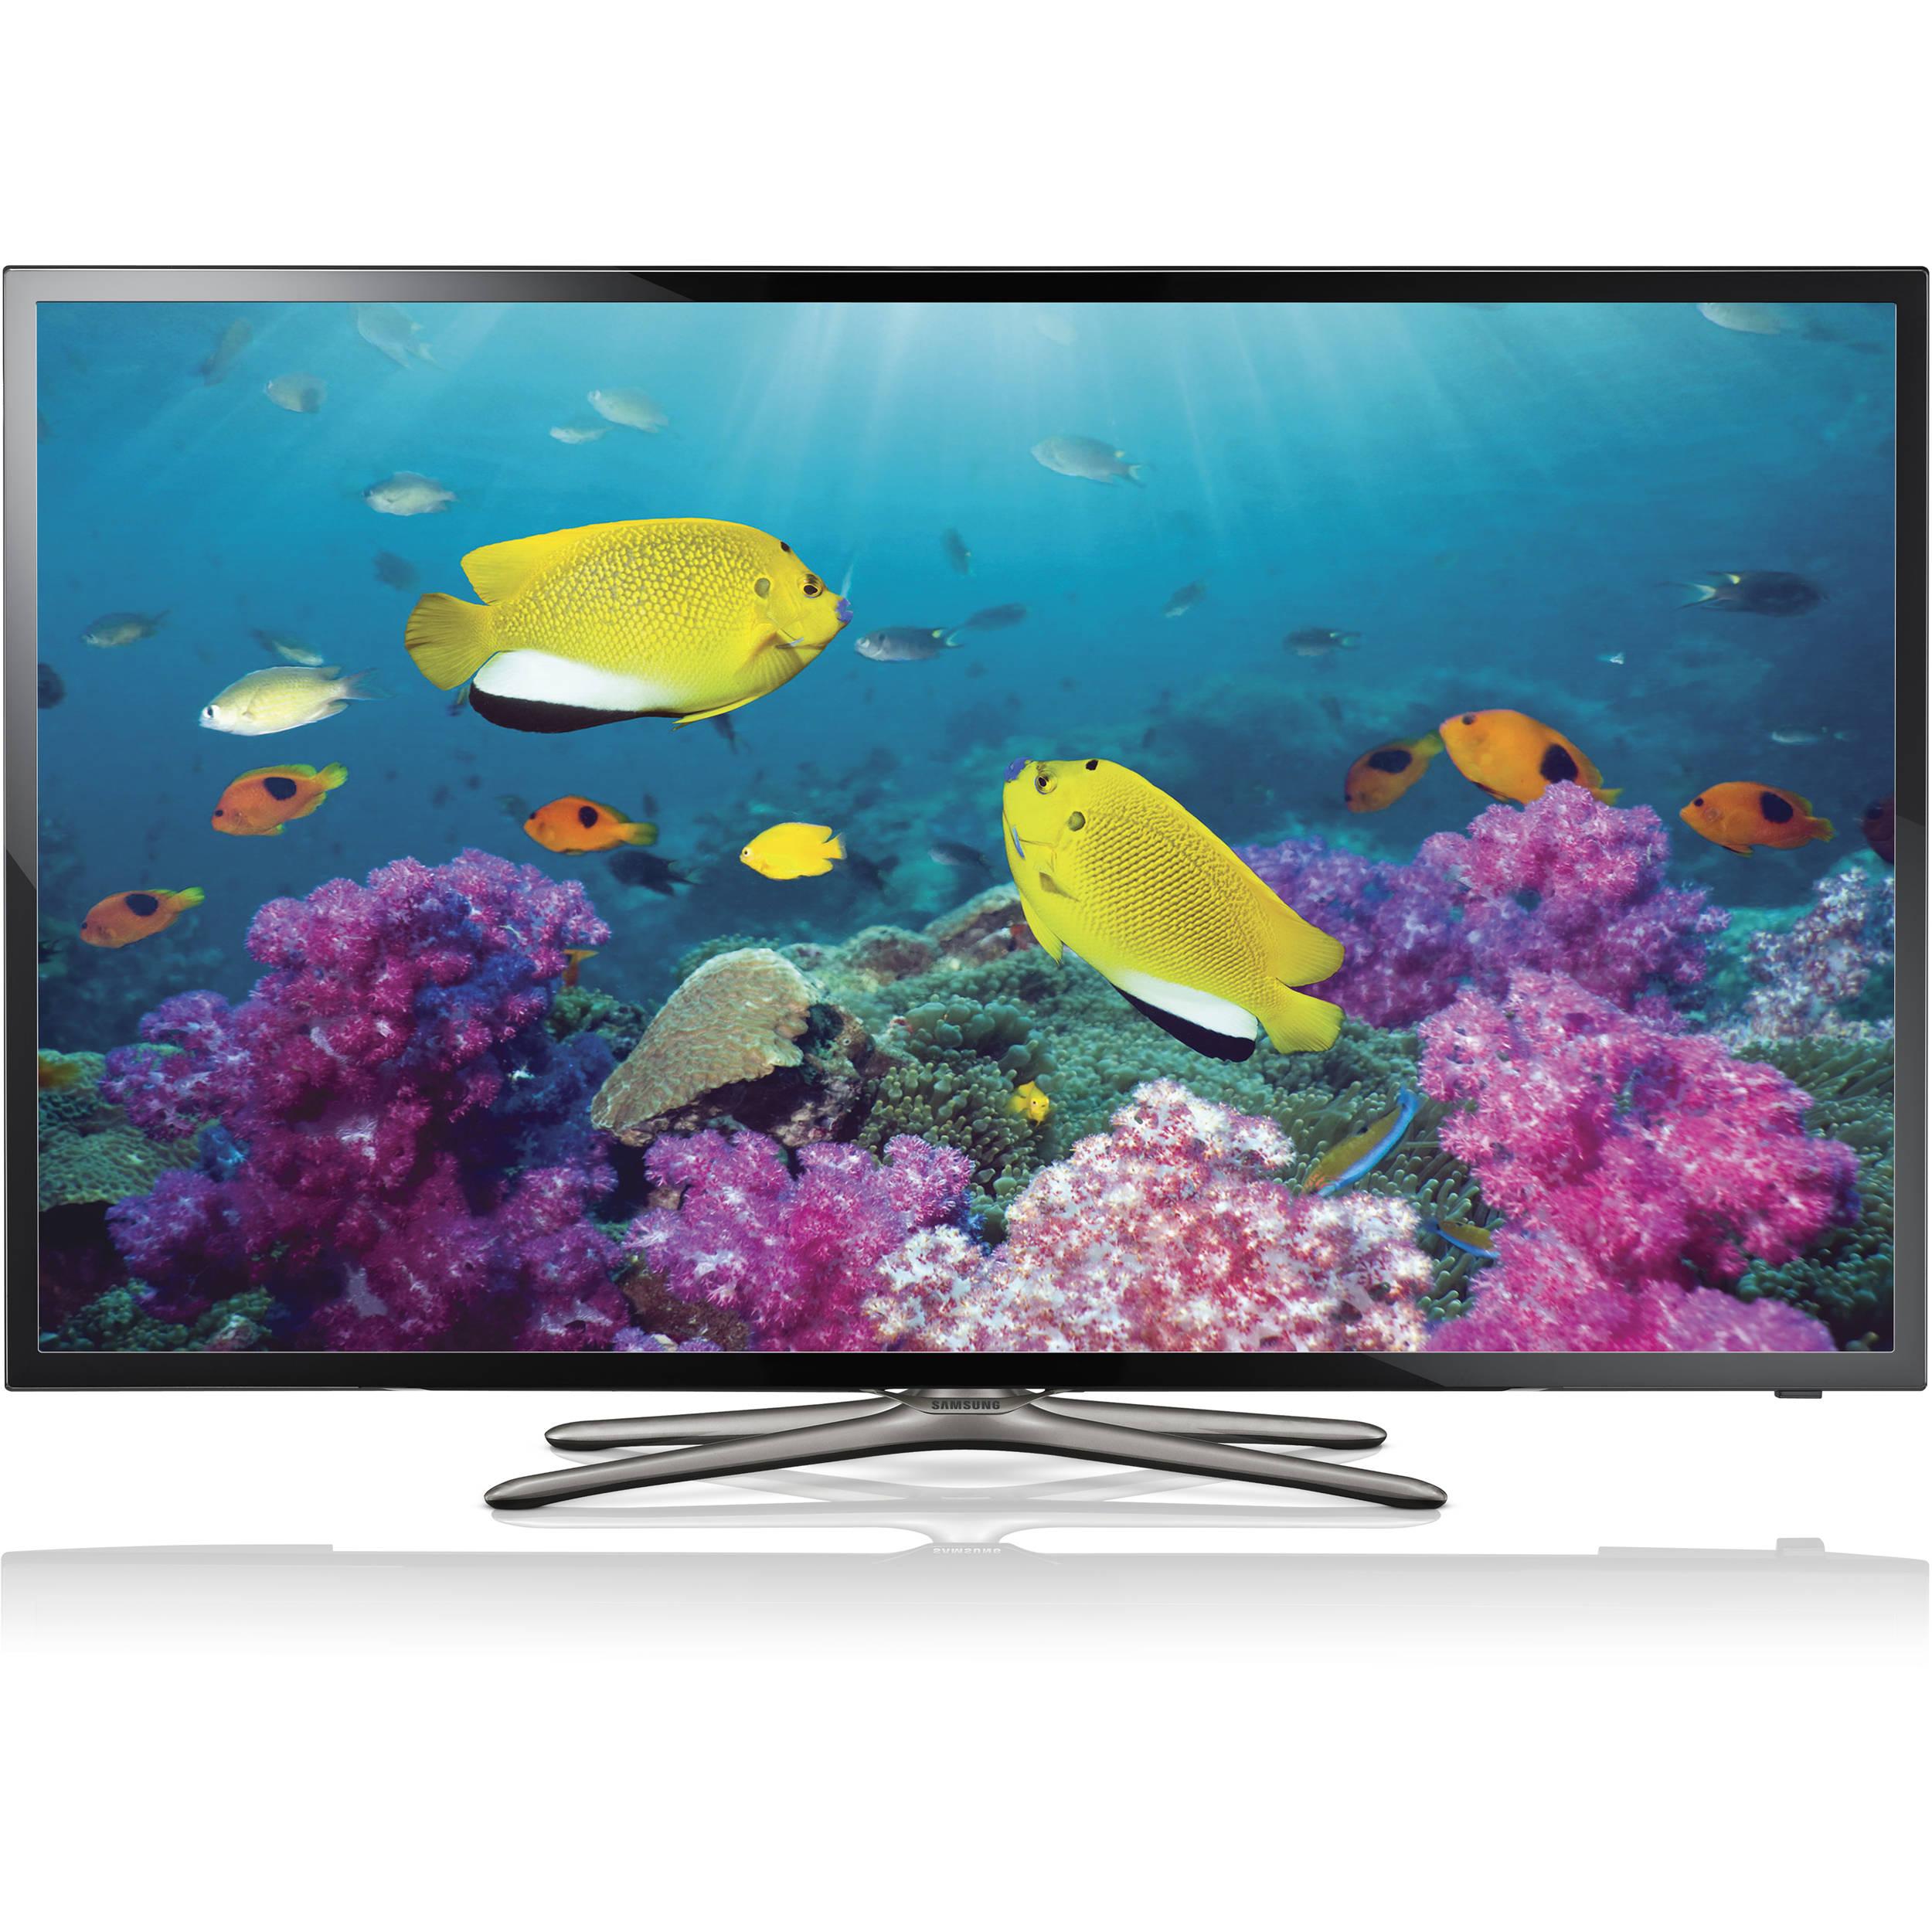 Samsung 40 5500 Full Hd Smart Led Tv Un40f5500afxza Bh